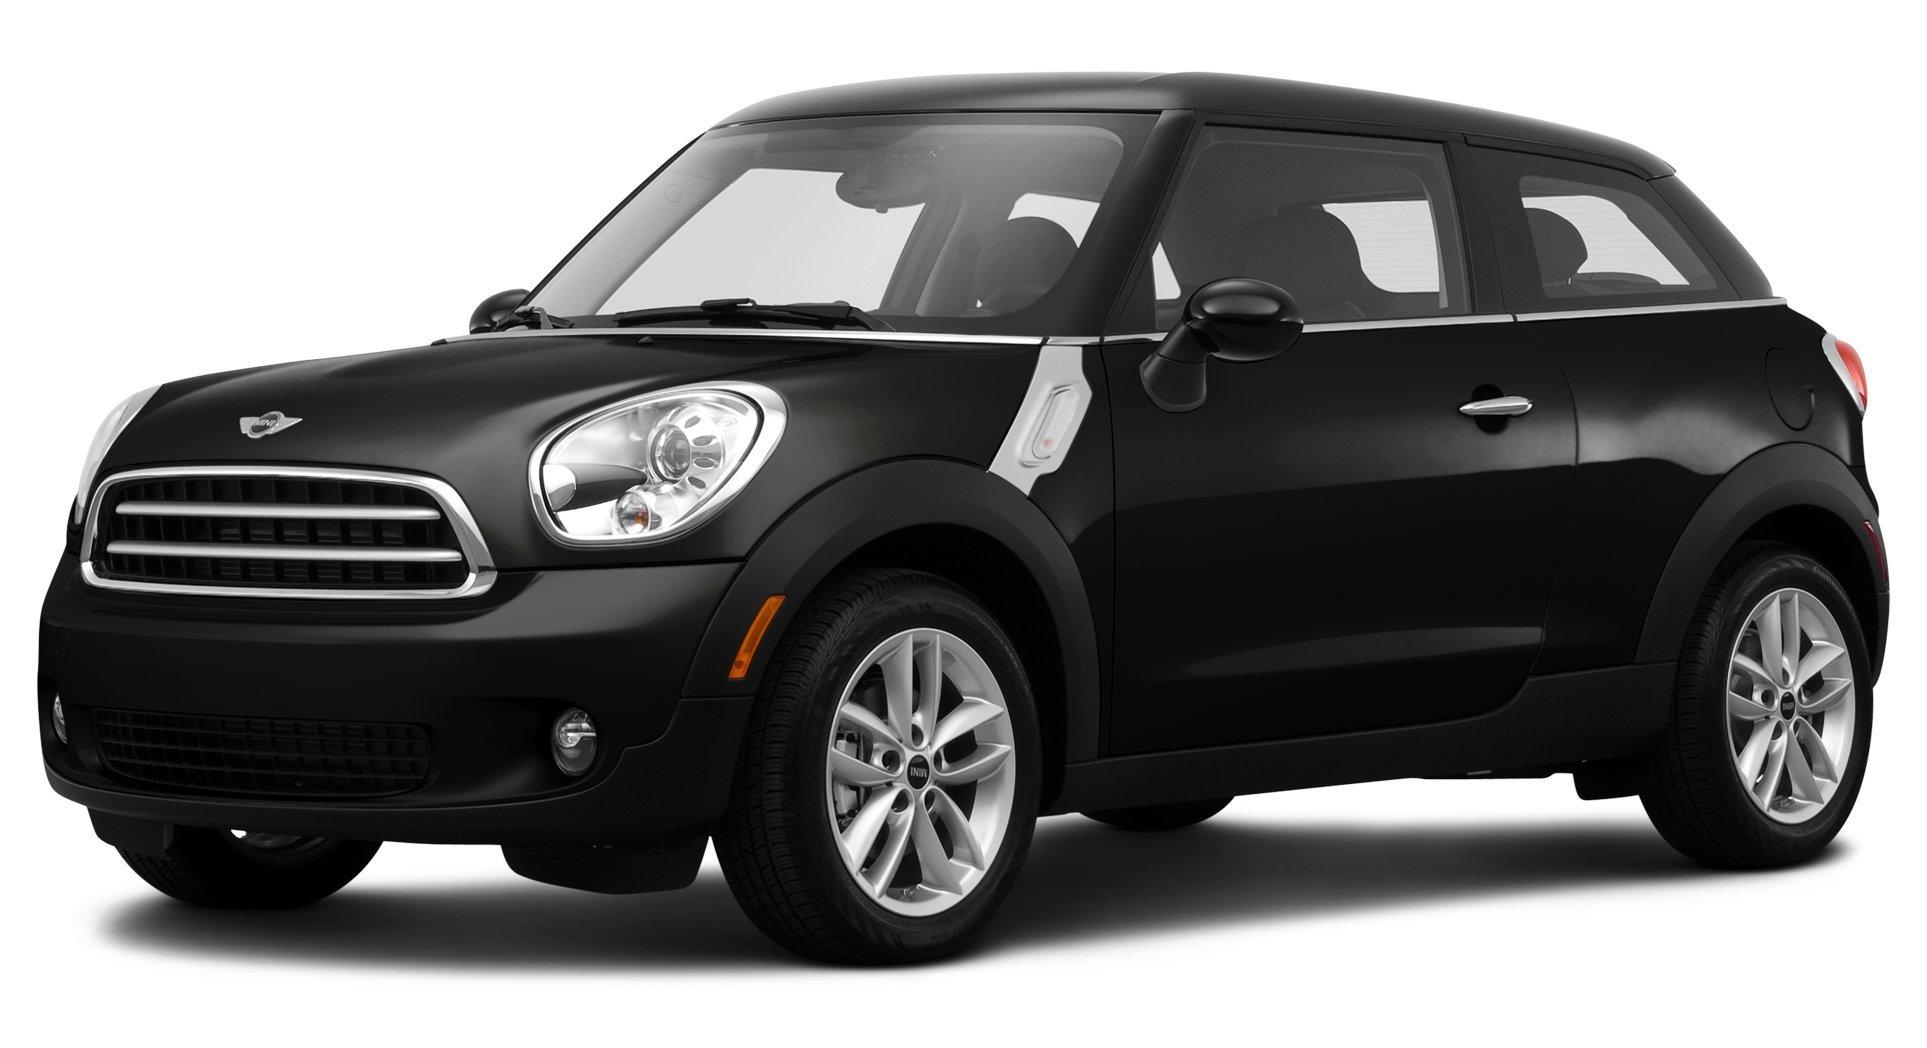 2013 mini cooper reviews images and specs vehicles. Black Bedroom Furniture Sets. Home Design Ideas